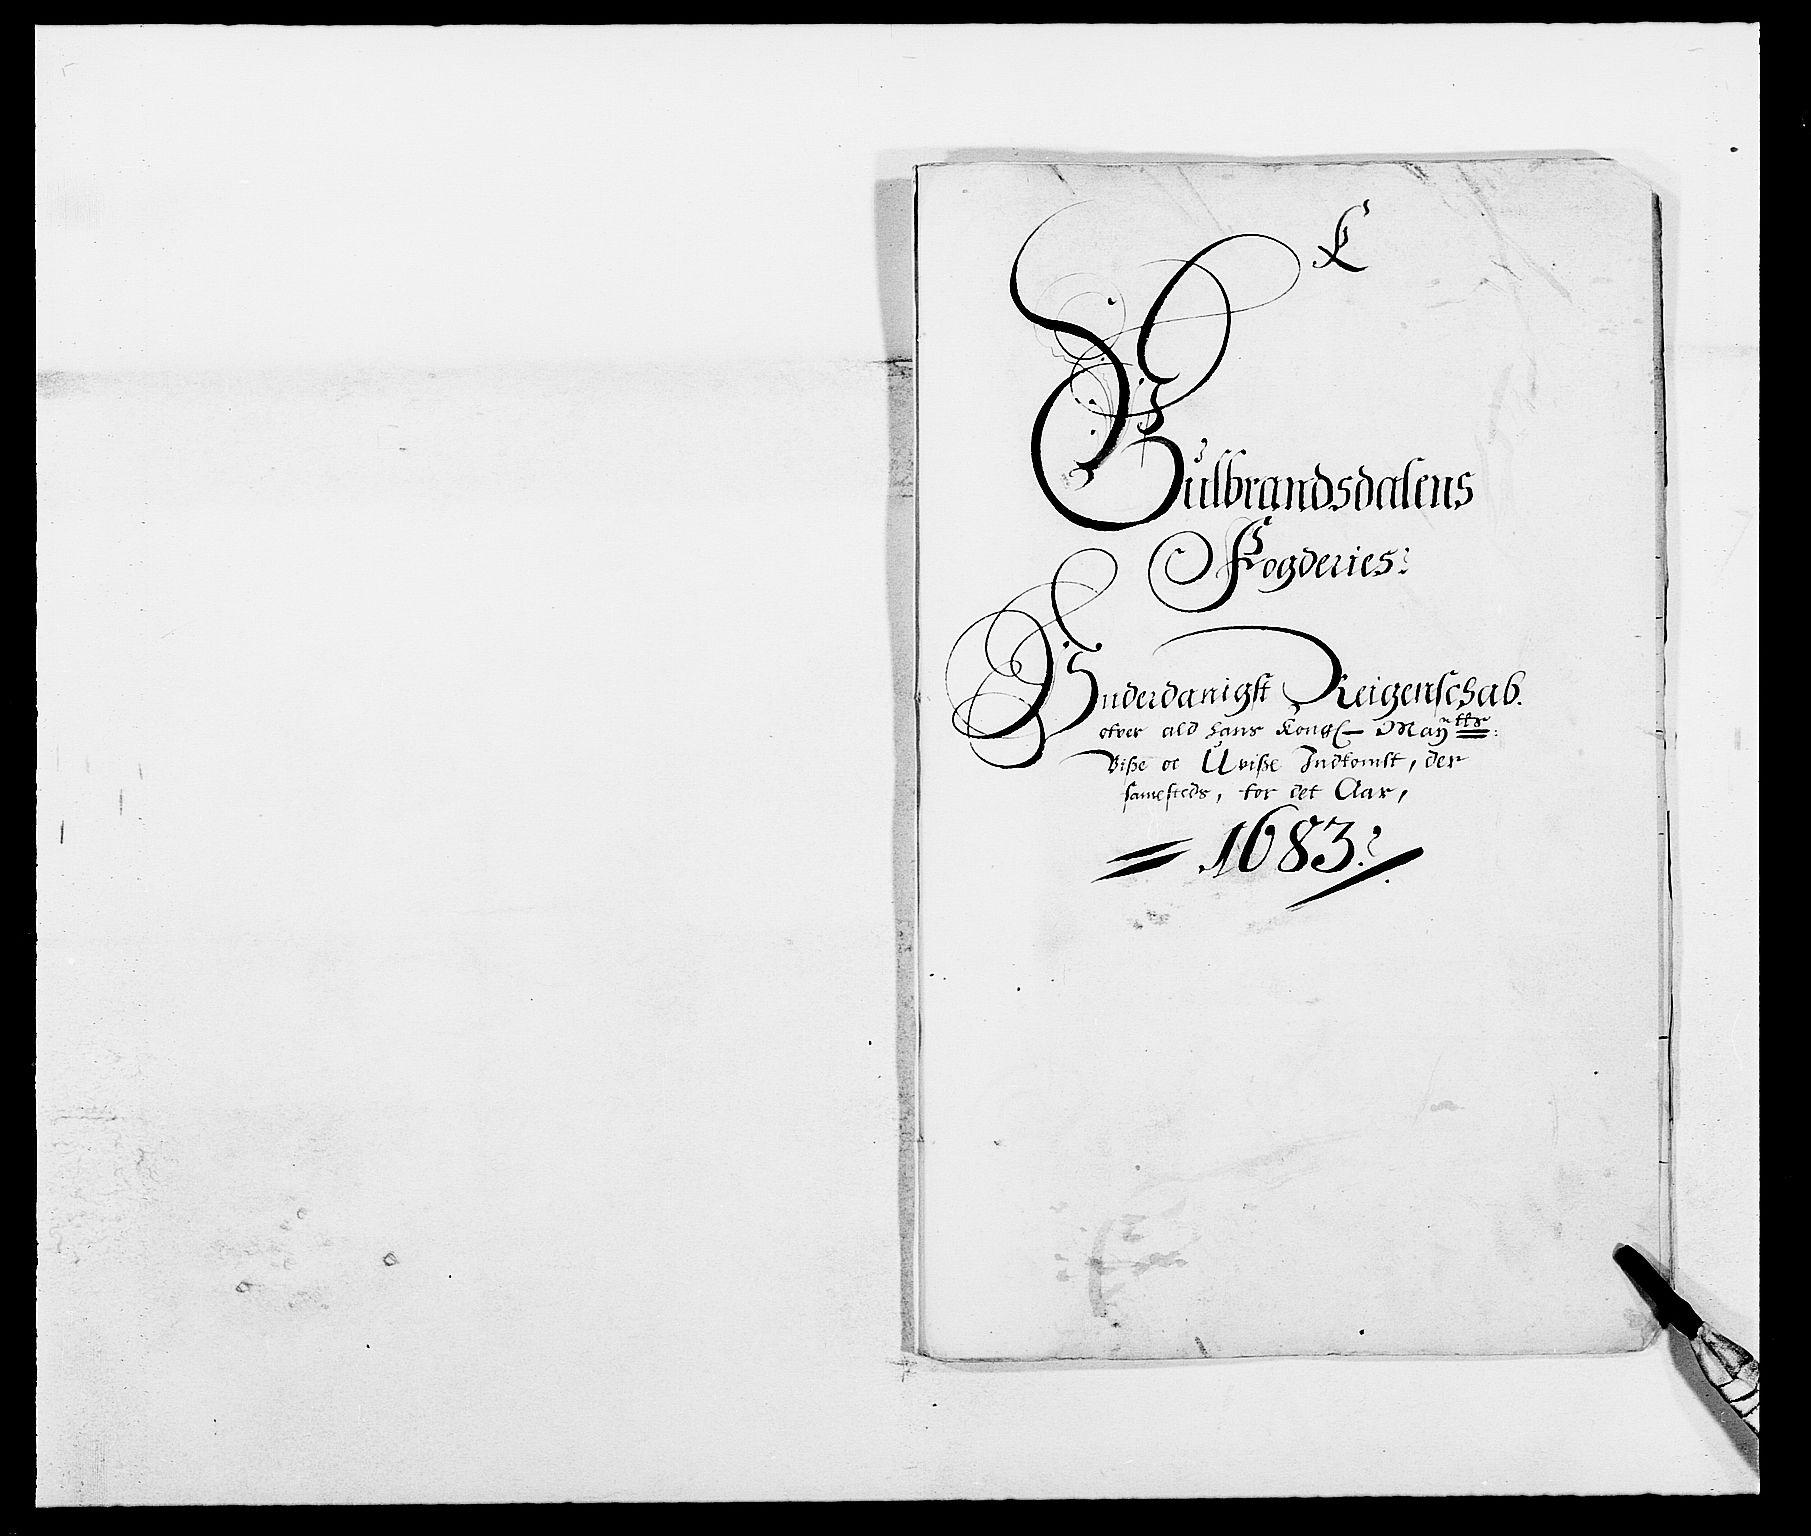 RA, Rentekammeret inntil 1814, Reviderte regnskaper, Fogderegnskap, R17/L1158: Fogderegnskap Gudbrandsdal, 1682-1689, s. 1